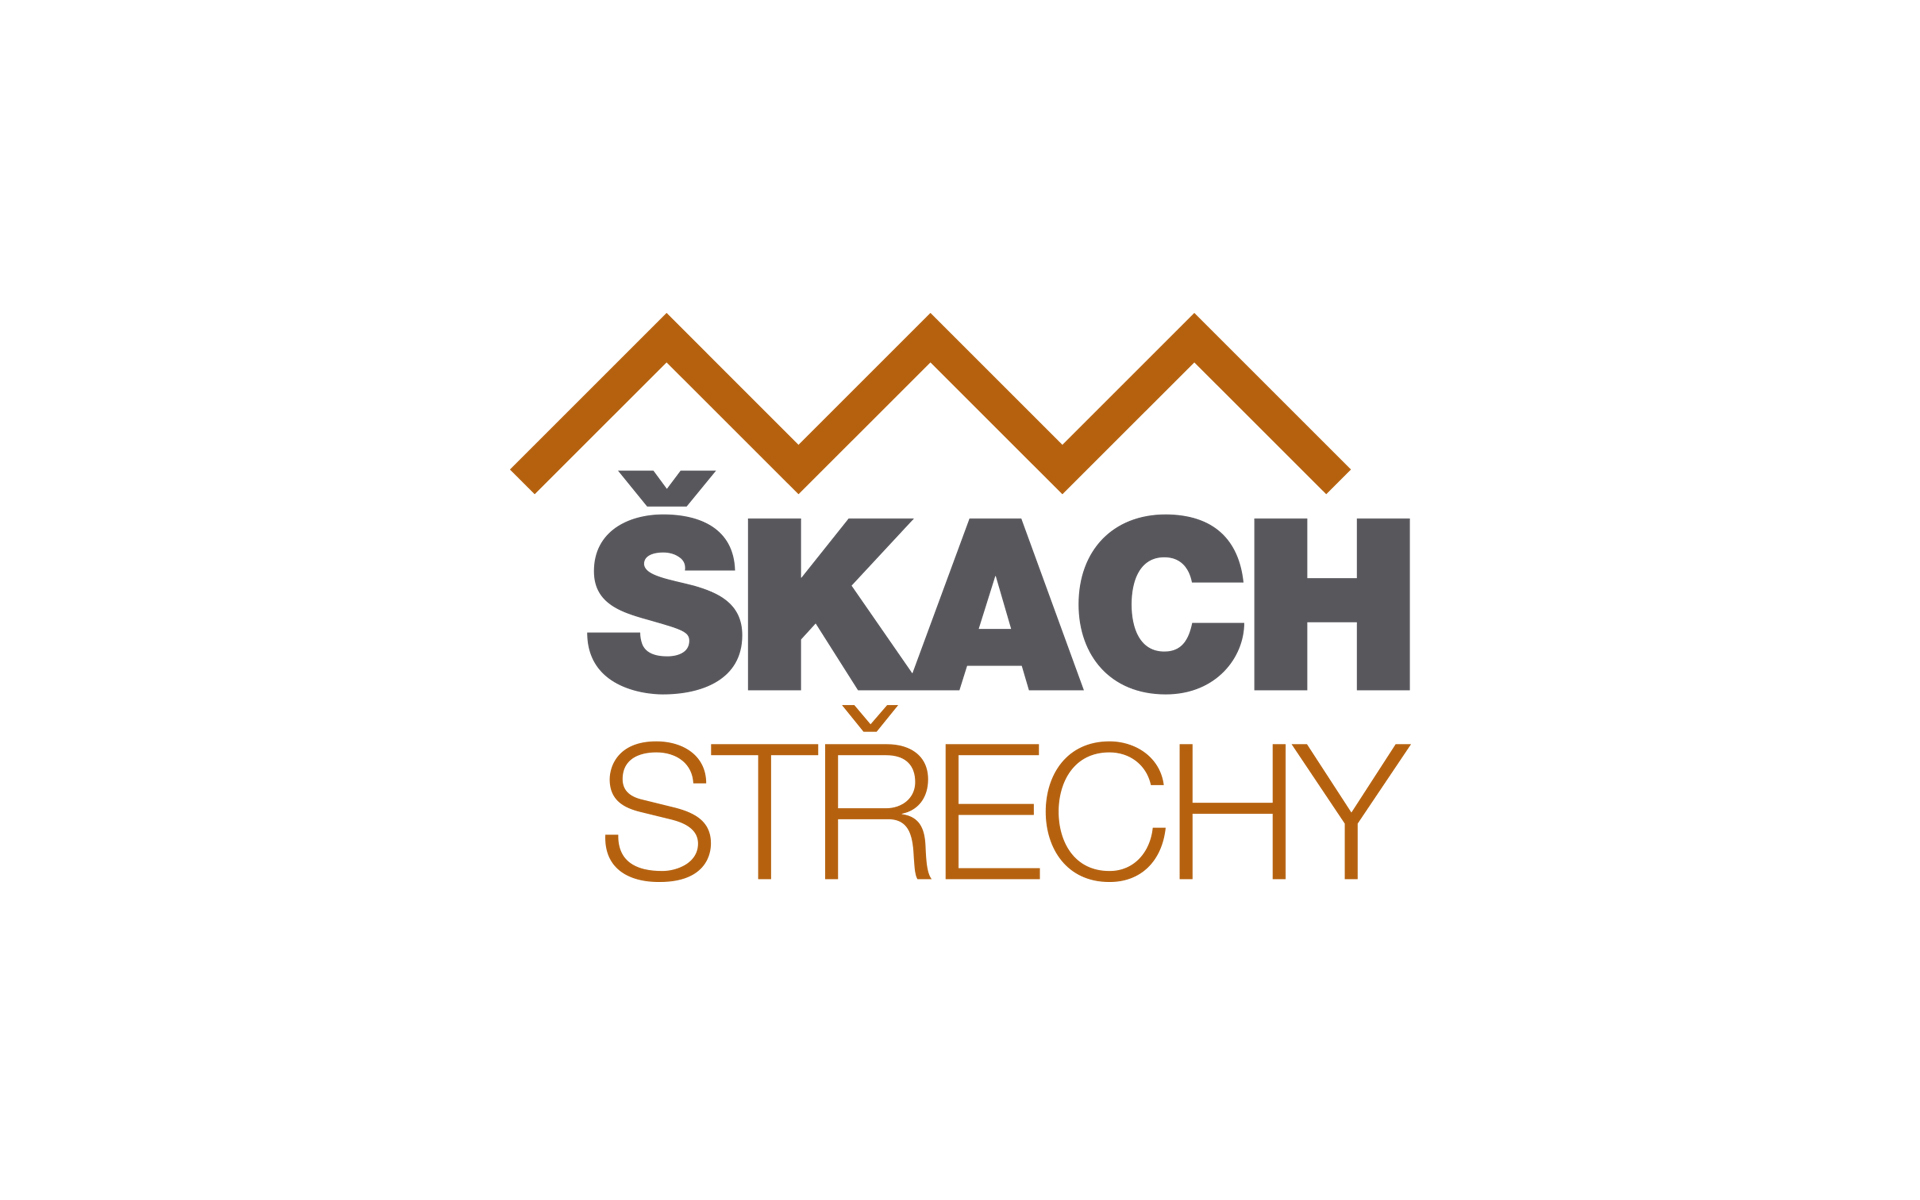 Skach_strechy